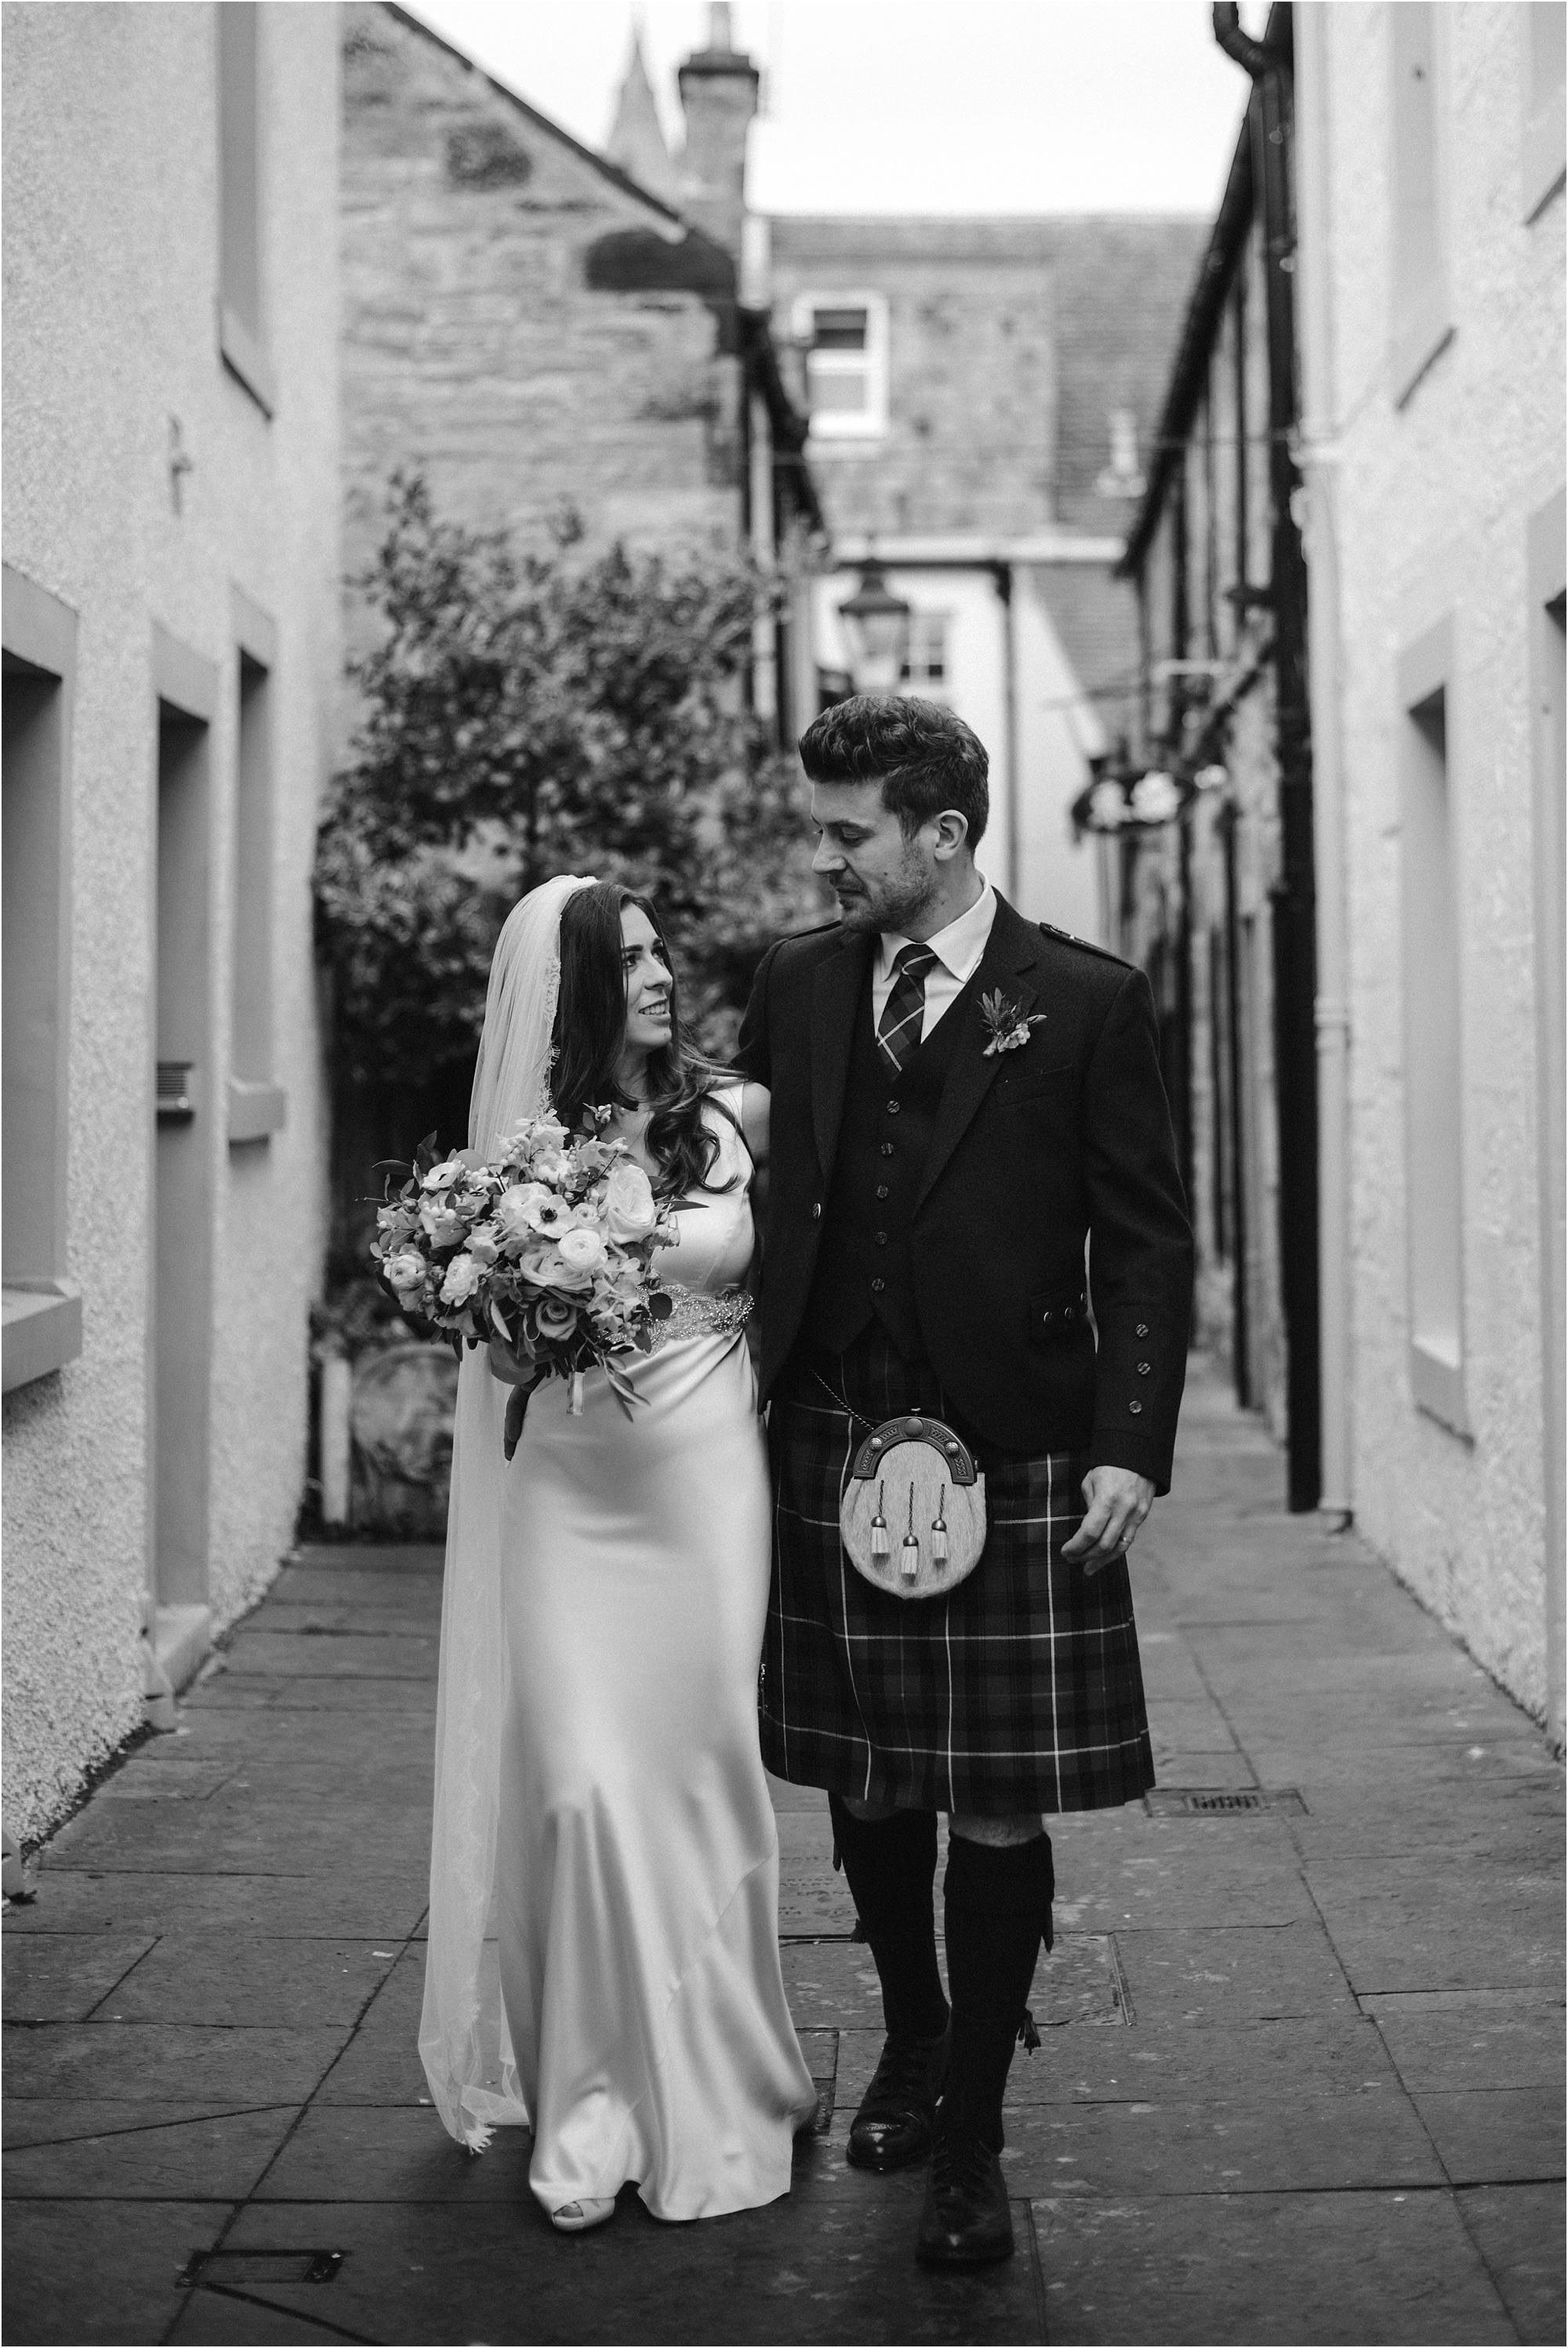 Scott+Joanna-Kinkell-Byre-wedding-fife-photography__0047.jpg